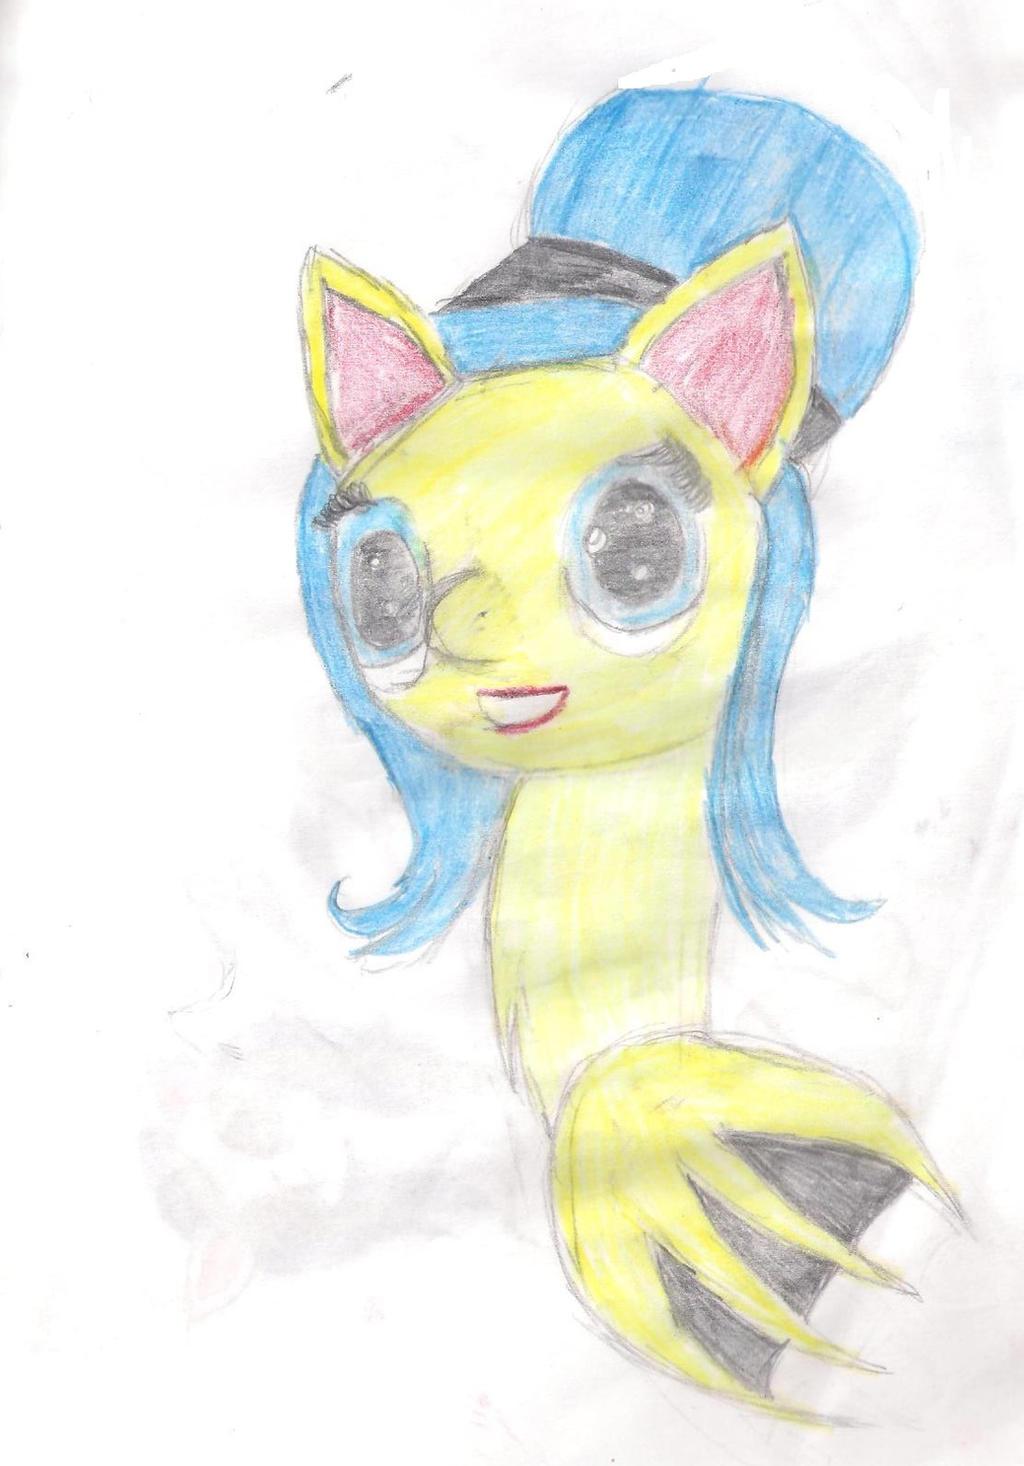 Koczek Mlp by Lunajula